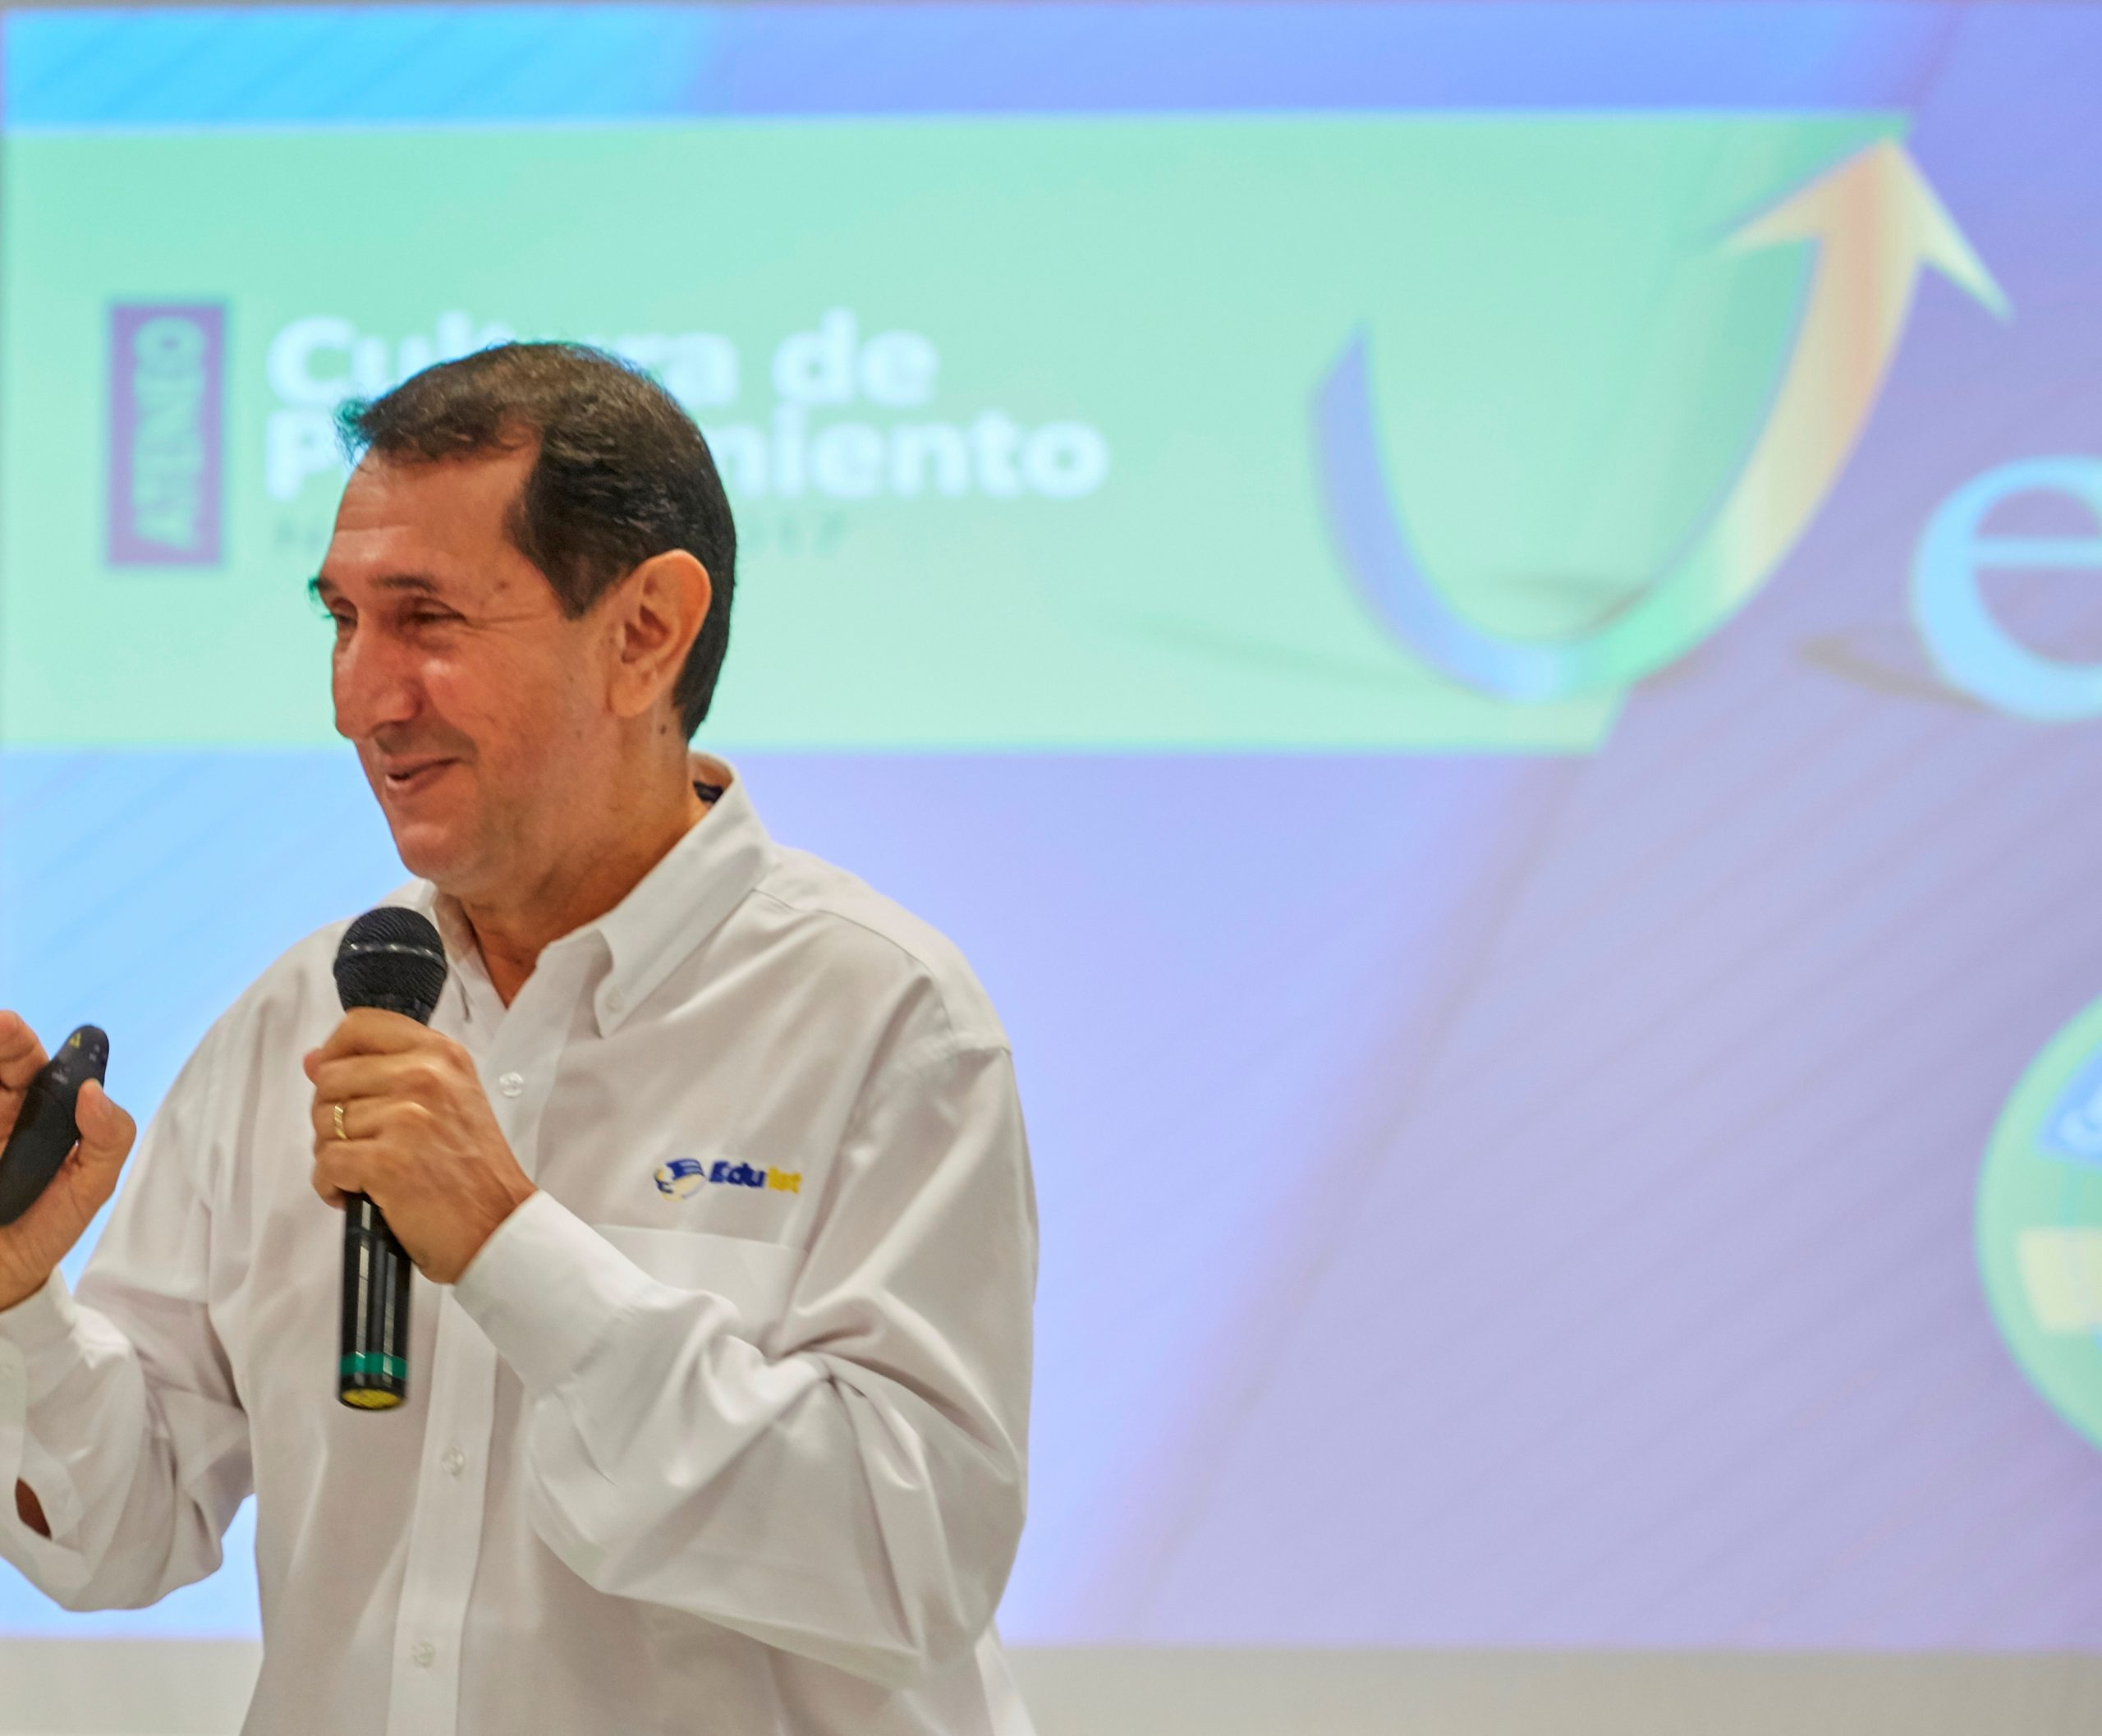 Educación en tiempos de pandemia: entrevista con Gilberto Pinzón